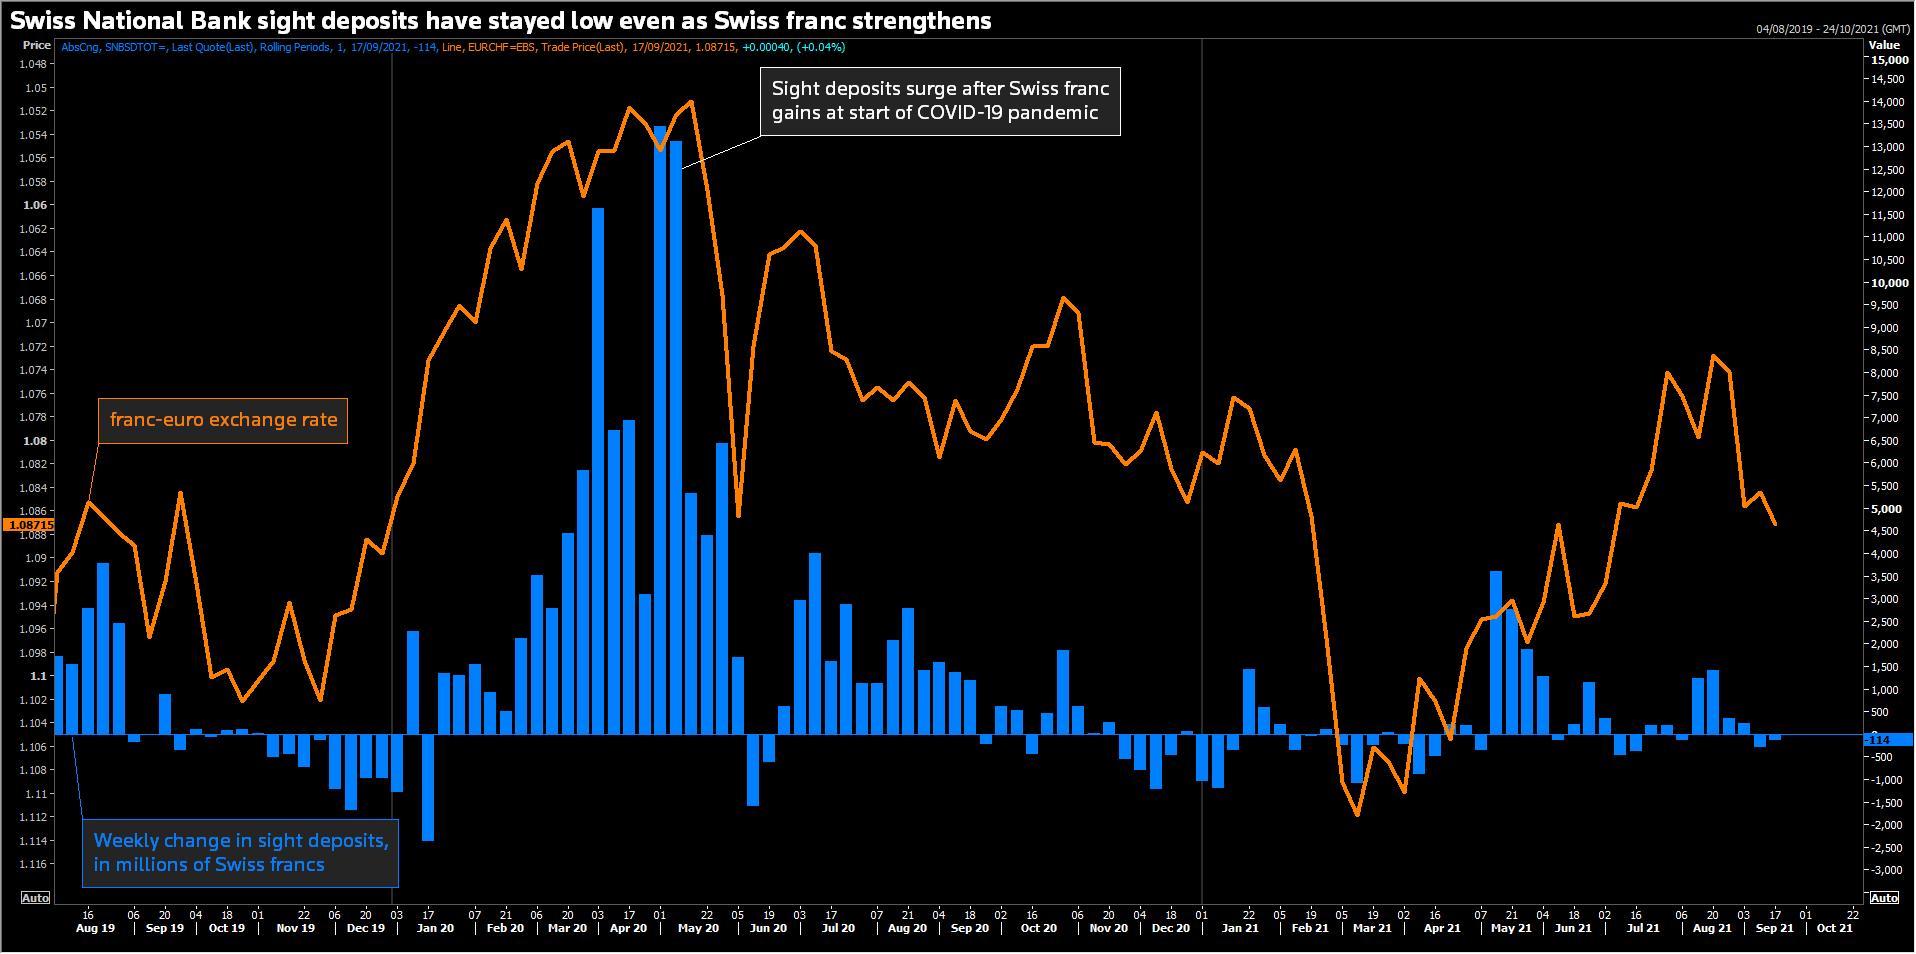 SNB sight deposits